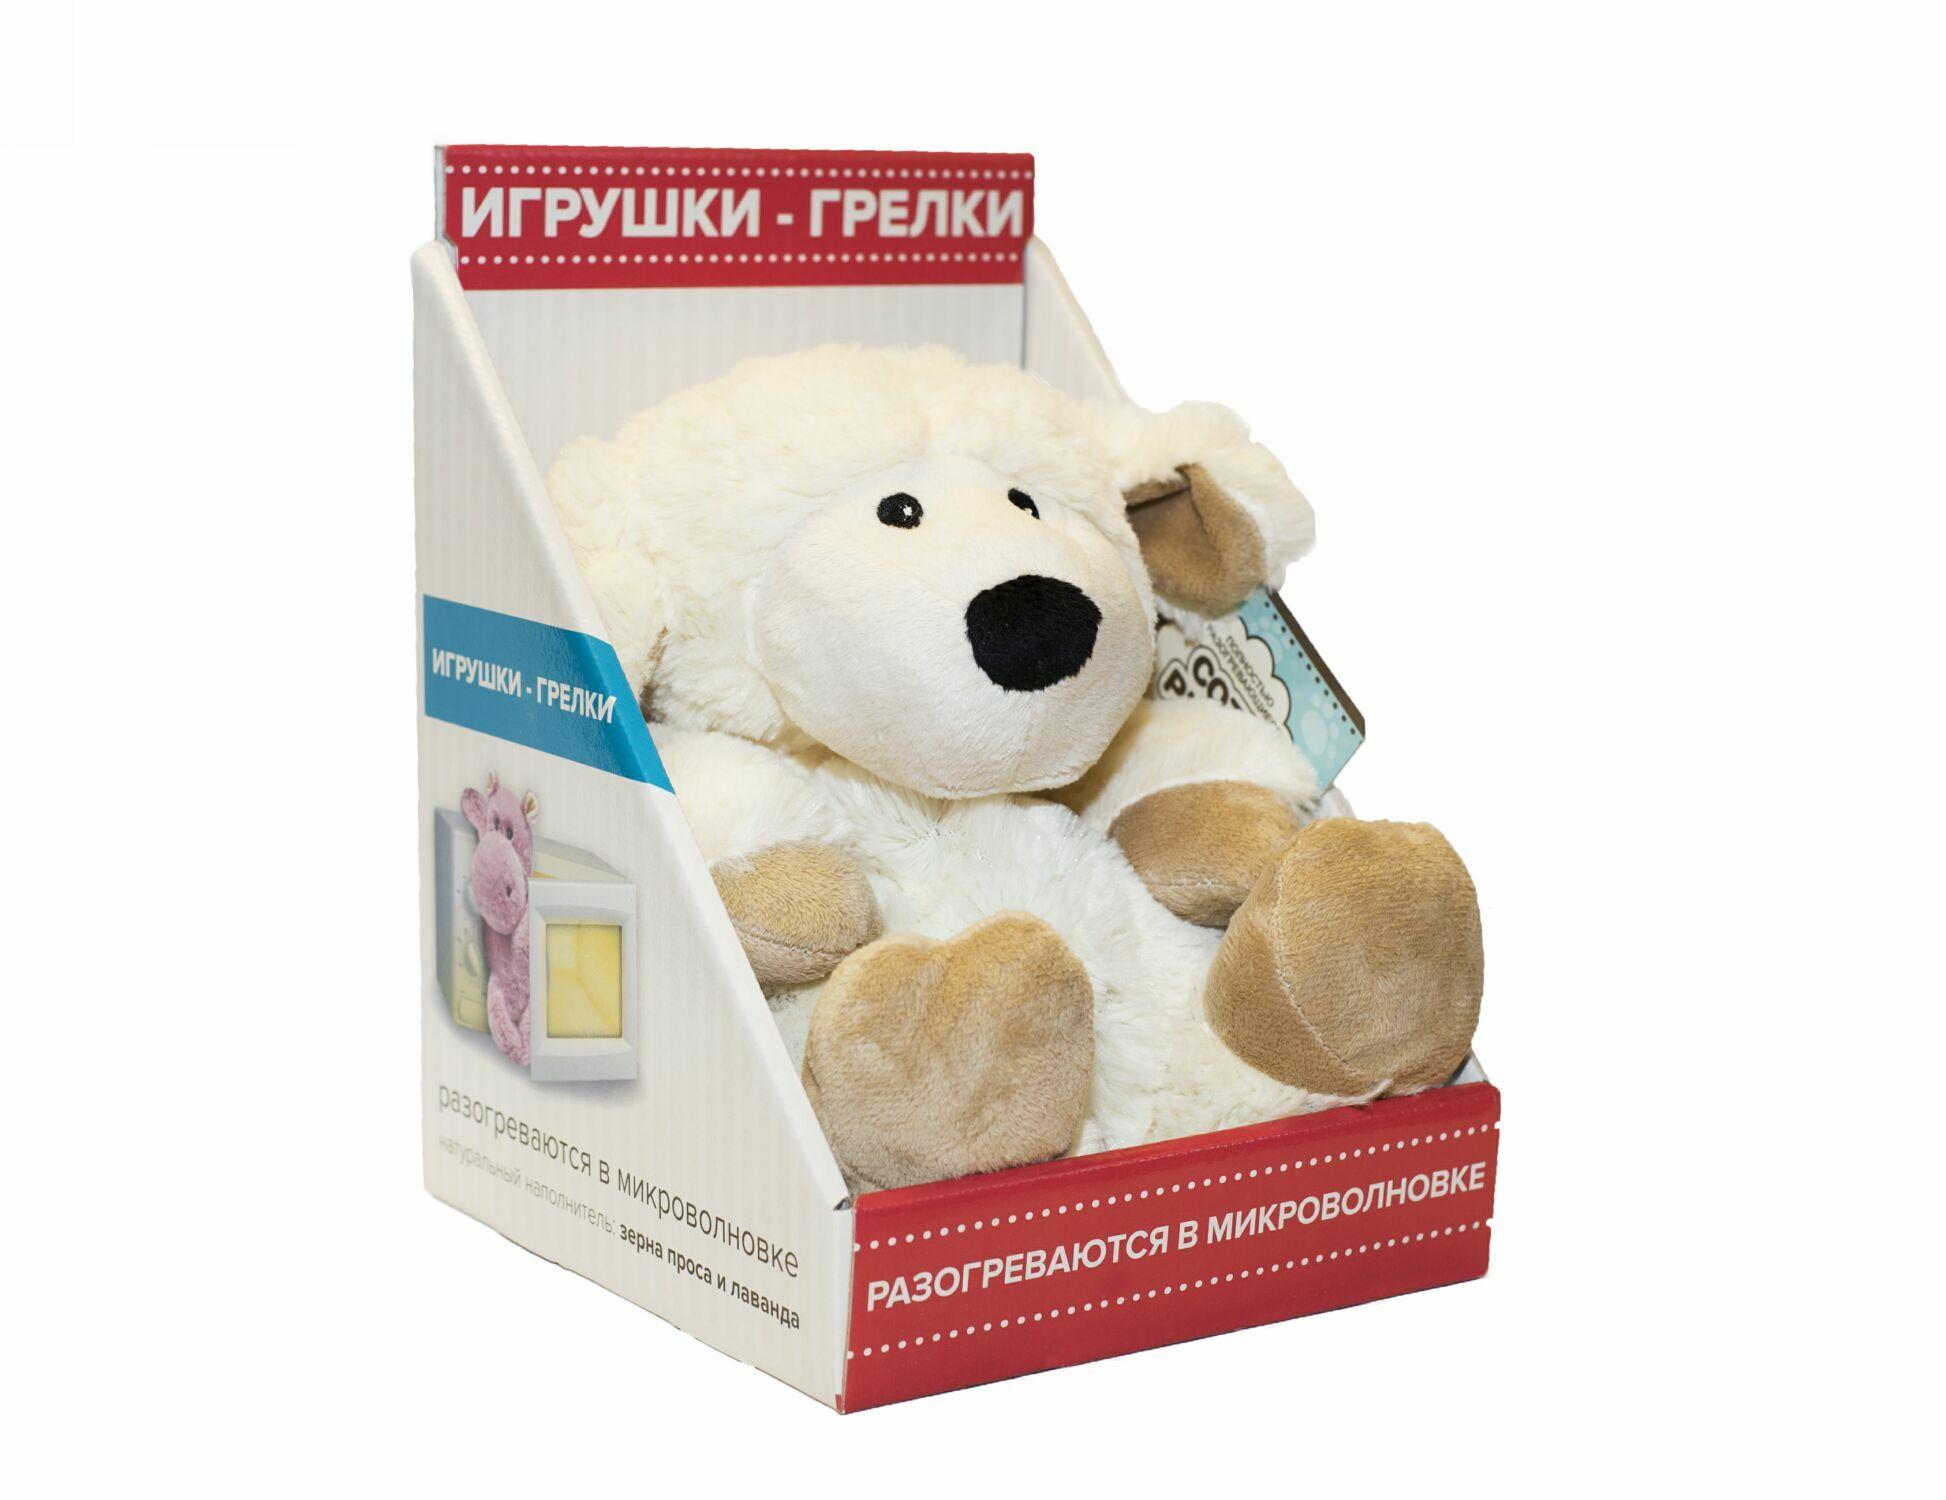 Пинкл (Pinkl) | Игрушка-грелка Овечка | Cozy Plush Microwaveable Soft Toy Sheep Intelex